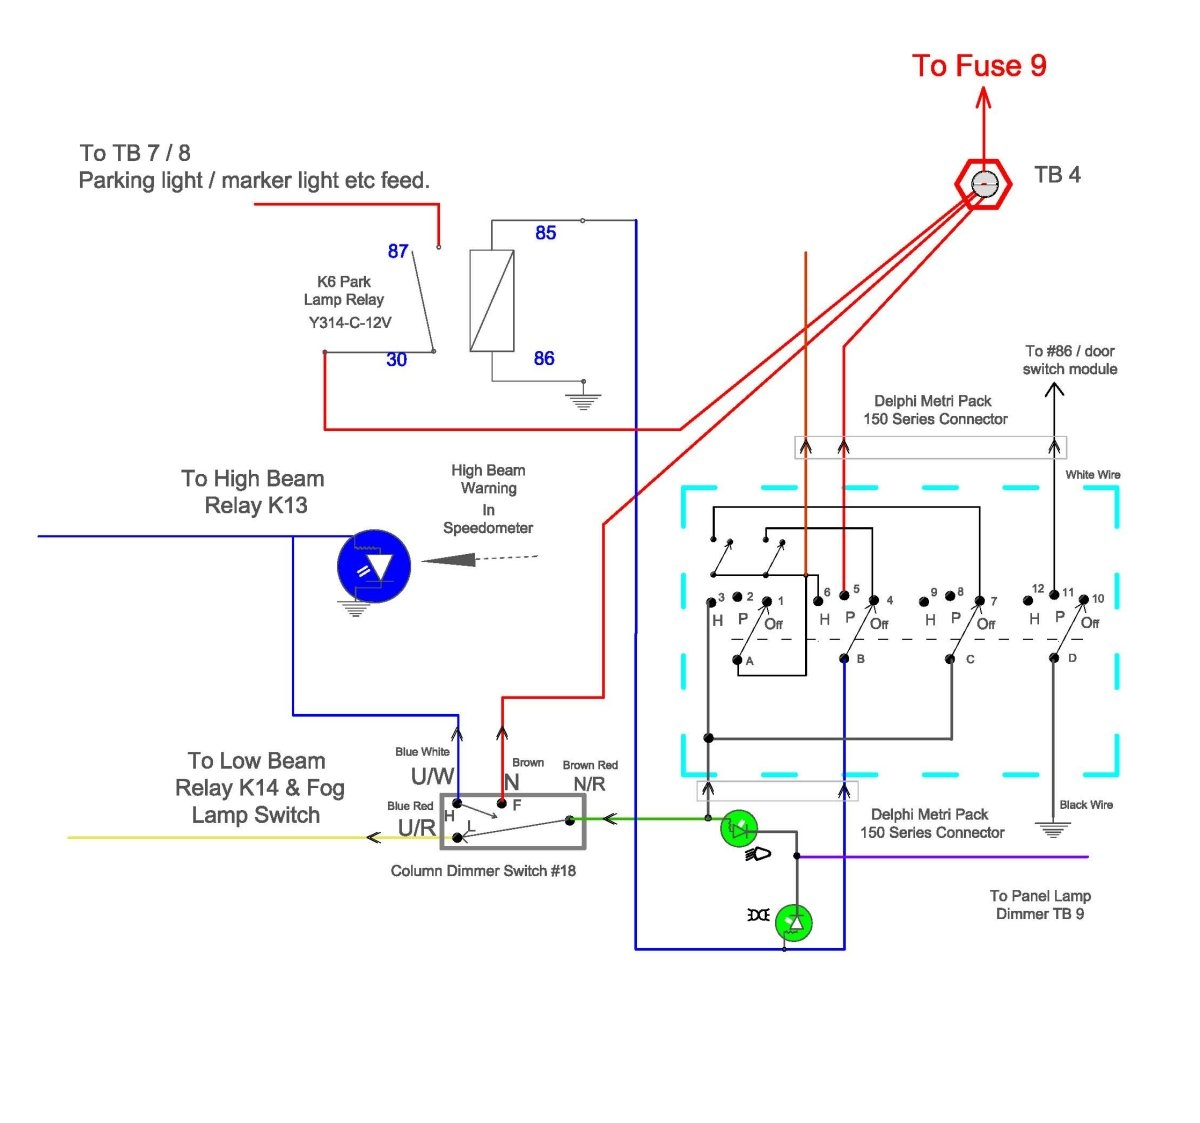 triumph tr3 color wiring diagram triumph spitfire ignition wiring diagram #8